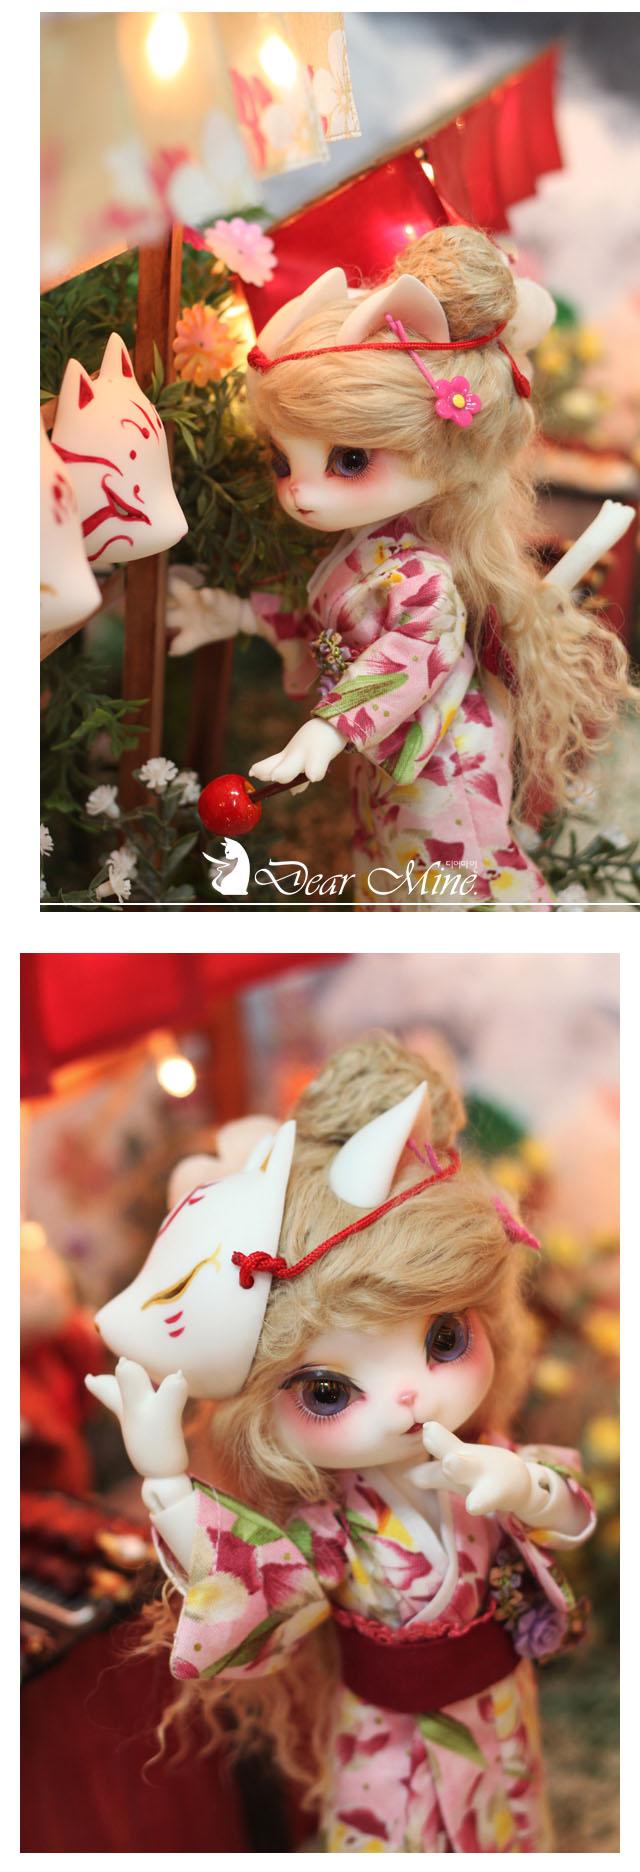 infinitidoll_siam Hanabi, mua bup be bjd dep, mua búp bê bjd đẹp, ball jointed doll, bunnyforever